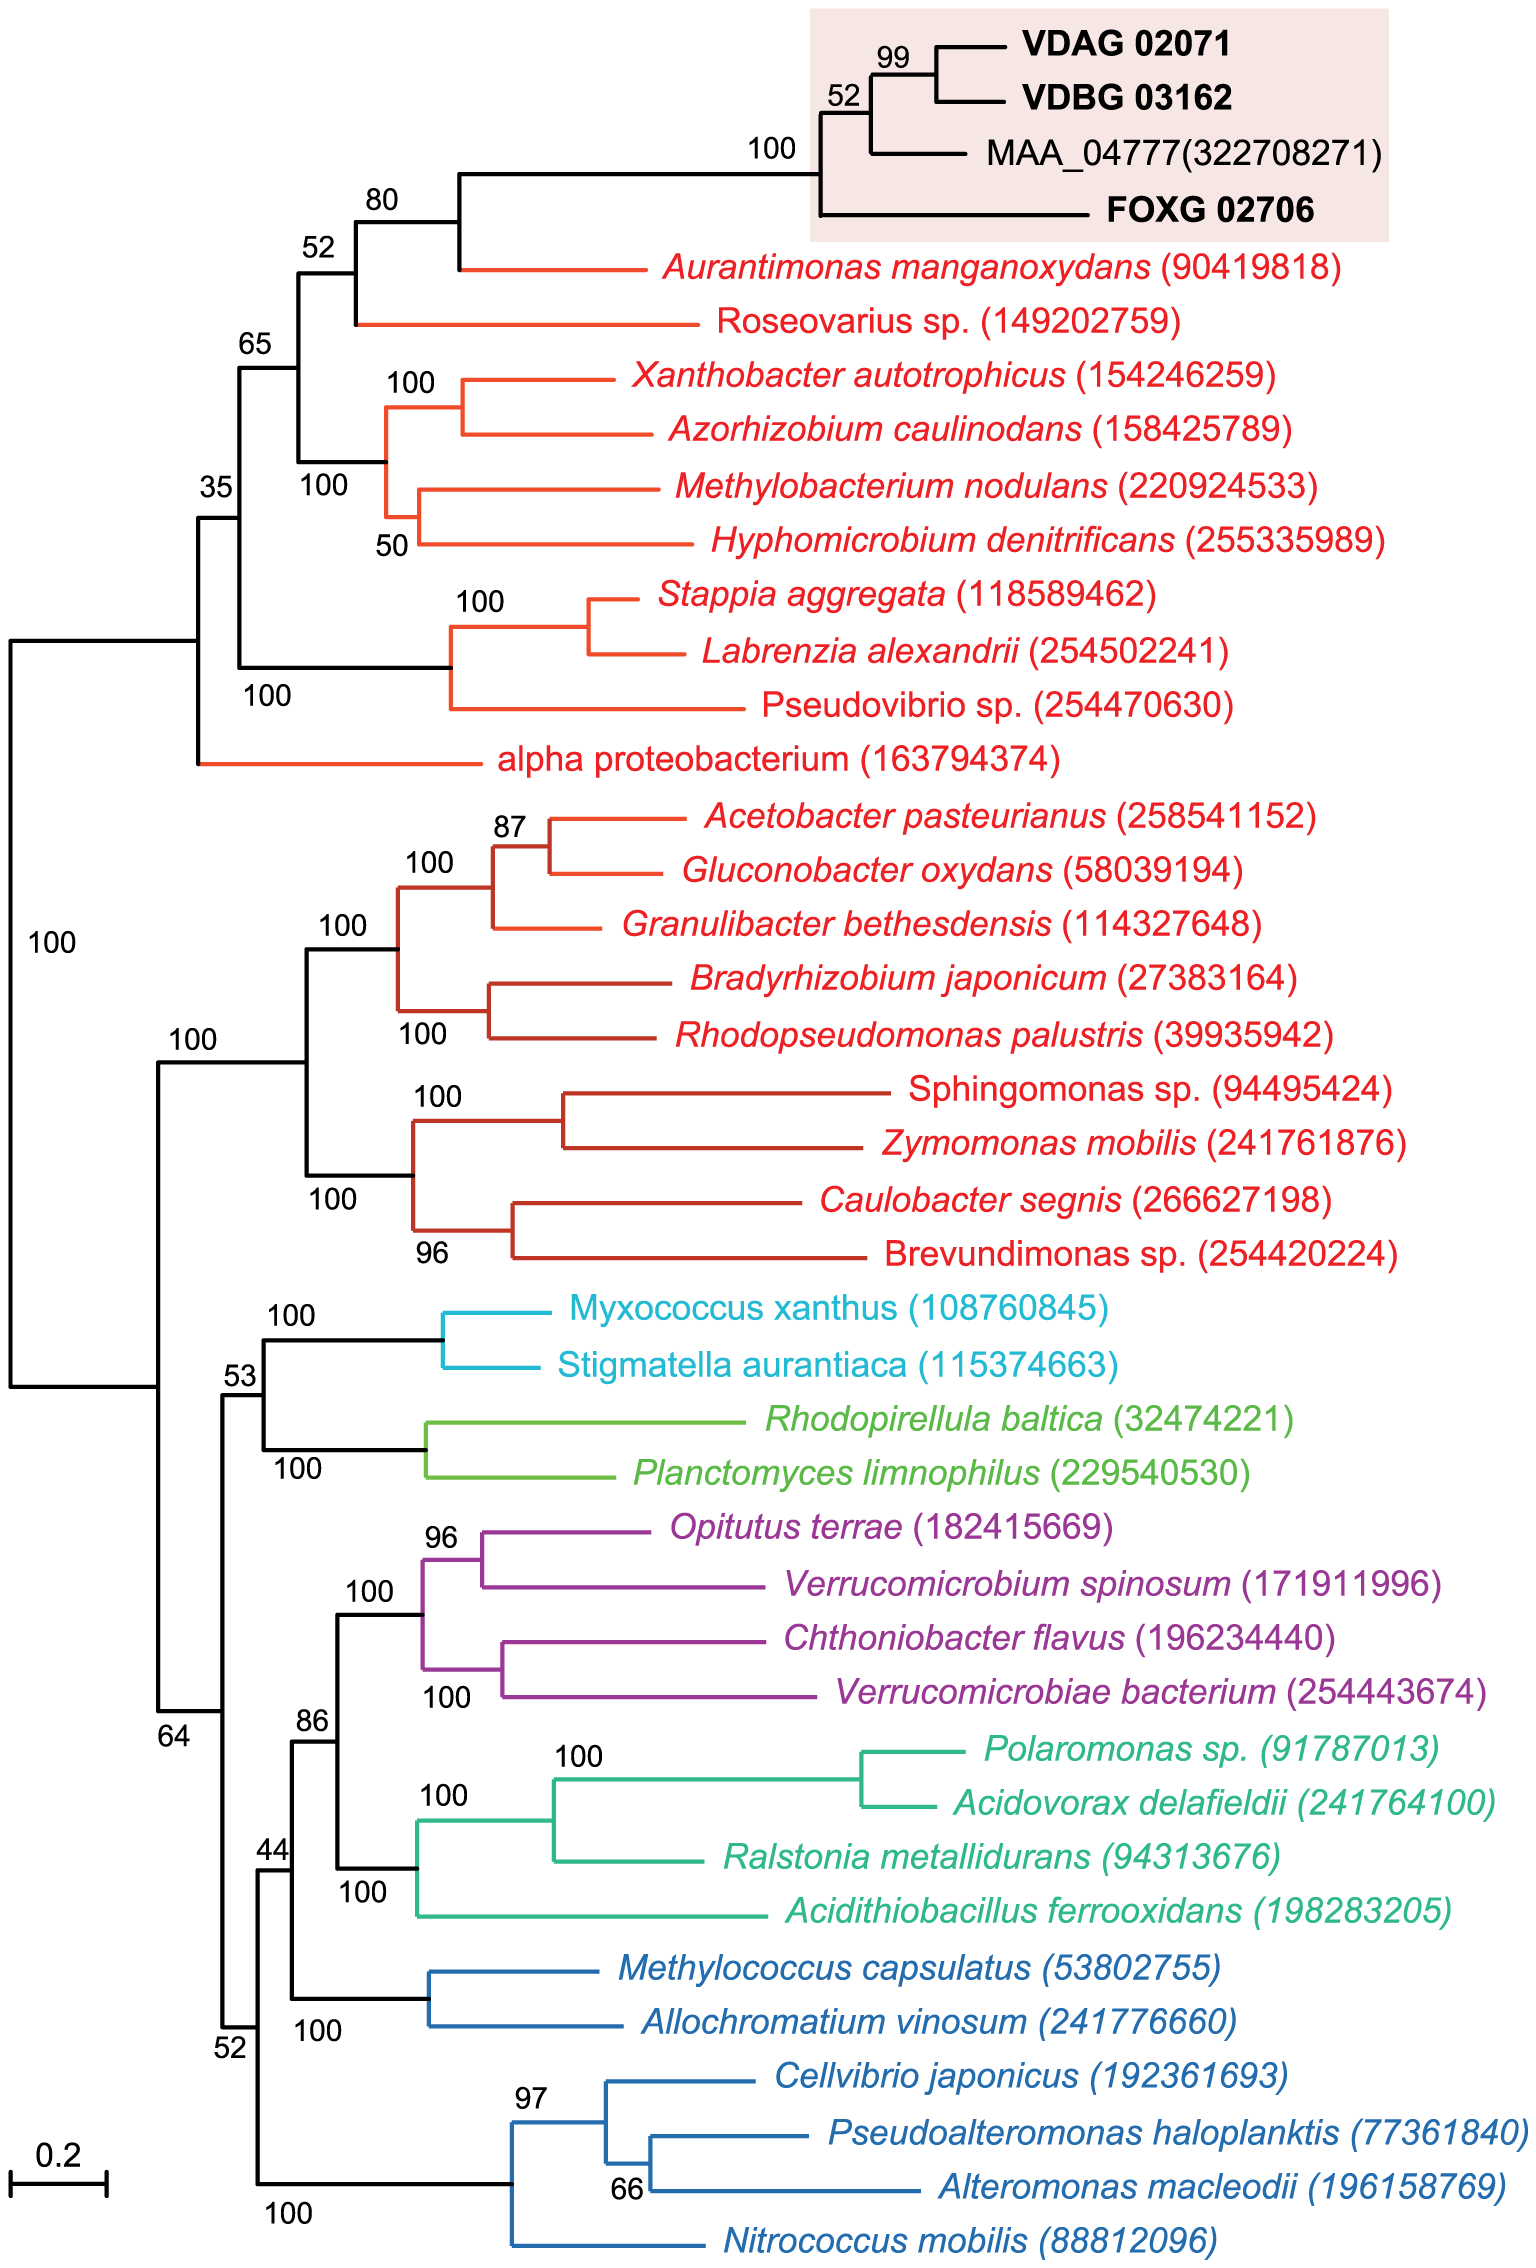 A maximum-likelihood tree including four glucosyltransferase proteins from the plant pathogens <i>V. dahliae</i> (VDAG_02071.1), <i>V. albo-atrum</i> (VDBG_03162.1), <i>Fusarium oxysporum</i> f. sp. <i>lycopersici</i> (FOXG_02706.2), and the insect pathogen <i>Metarhizium anisopliae</i> ARSEF 23 (Genbank accession EFY99848), and their relationship to bacterial homologs.